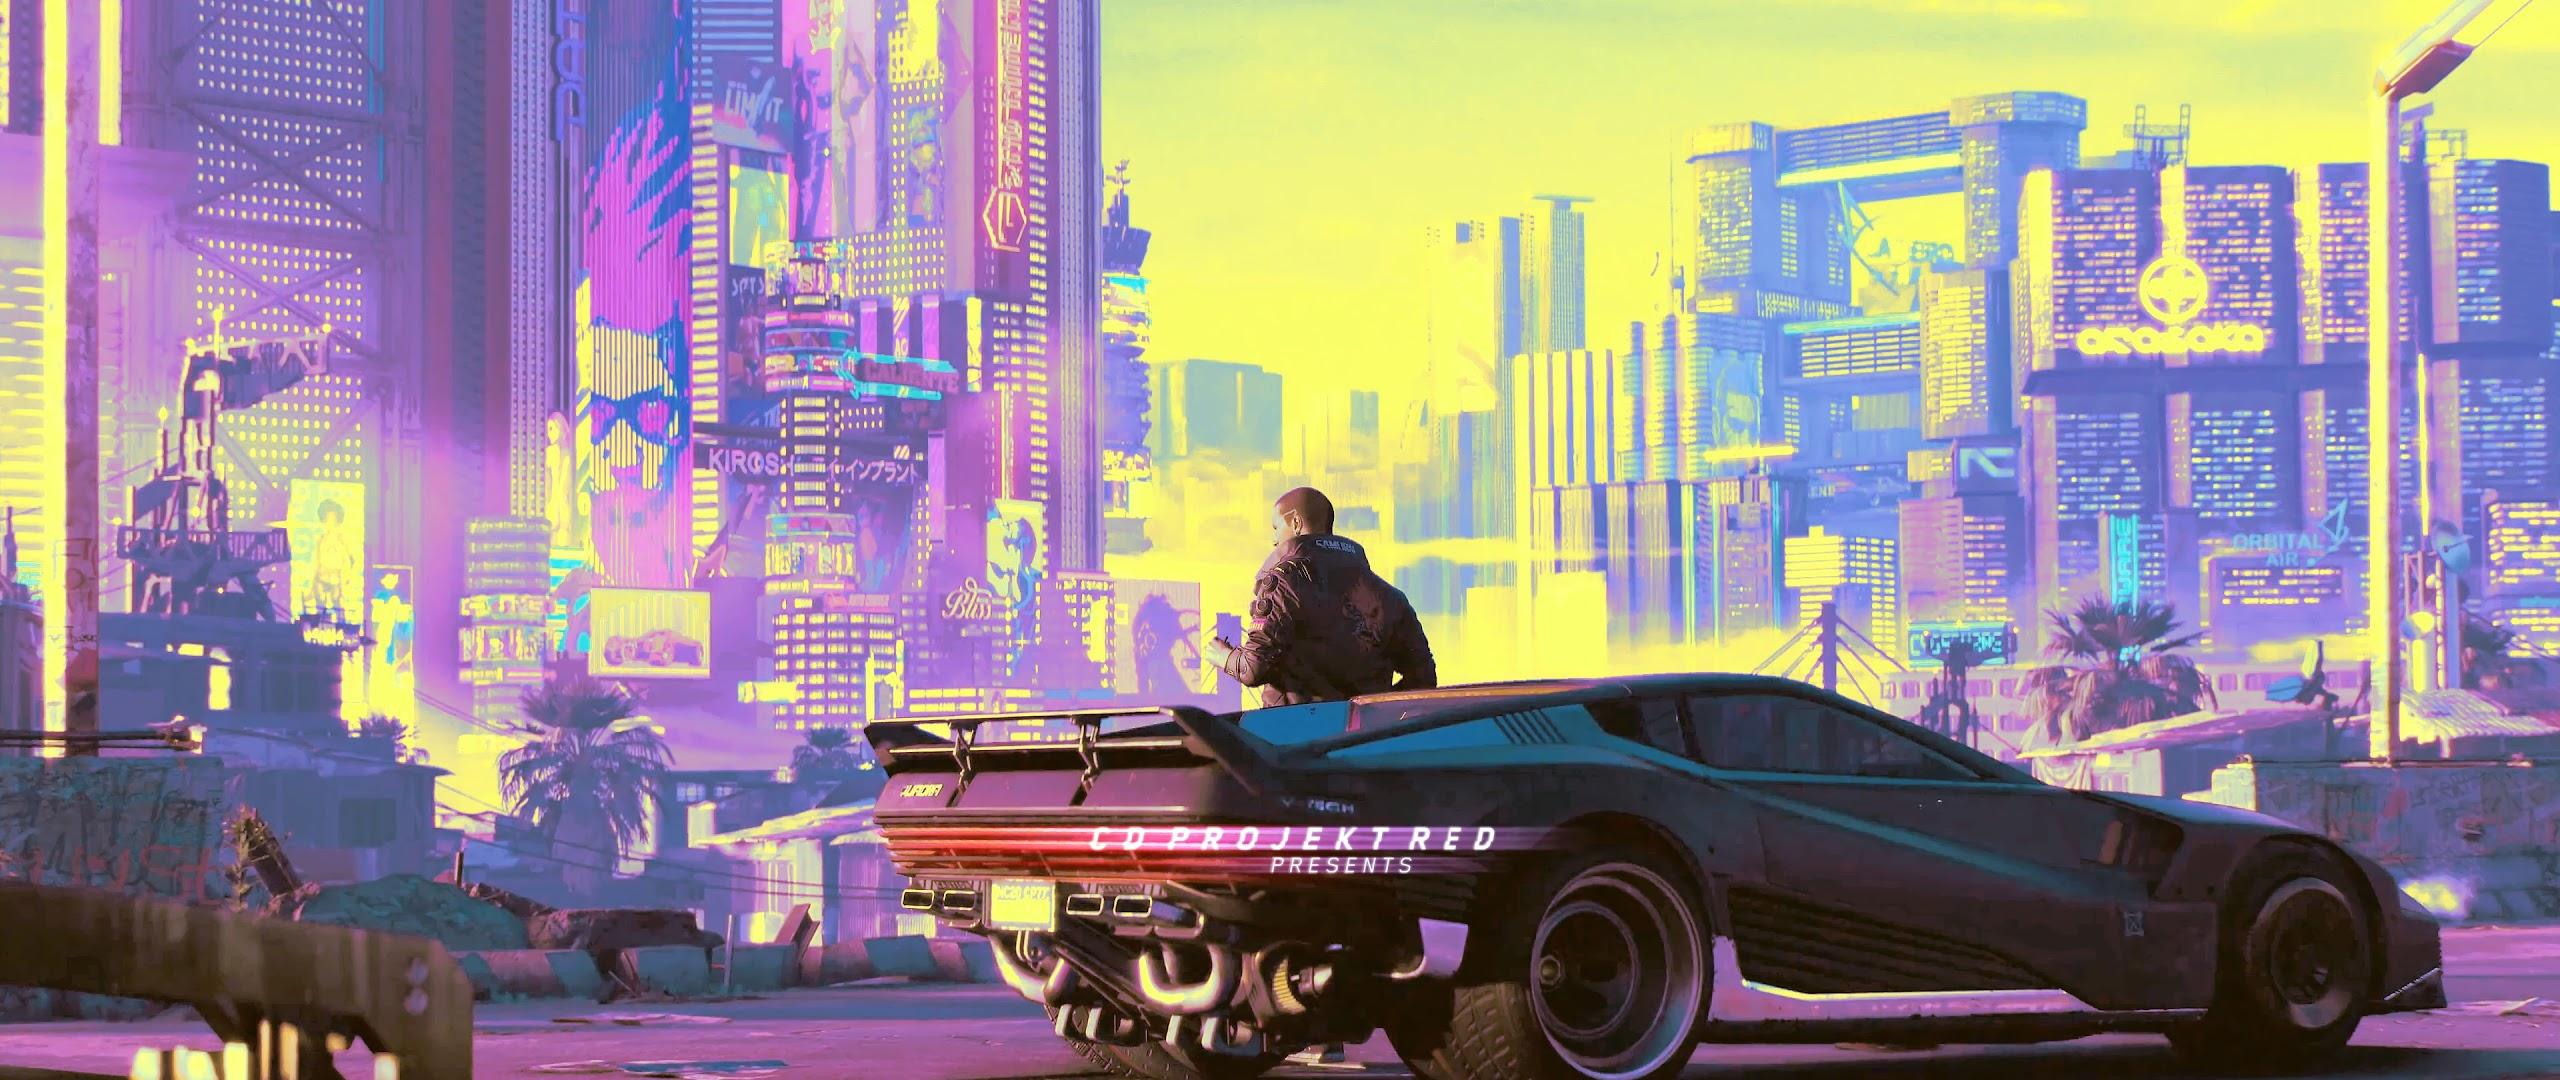 Cyberpunk 2077, V, Car, Quadra V-Tech, 4K, #46 Wallpaper